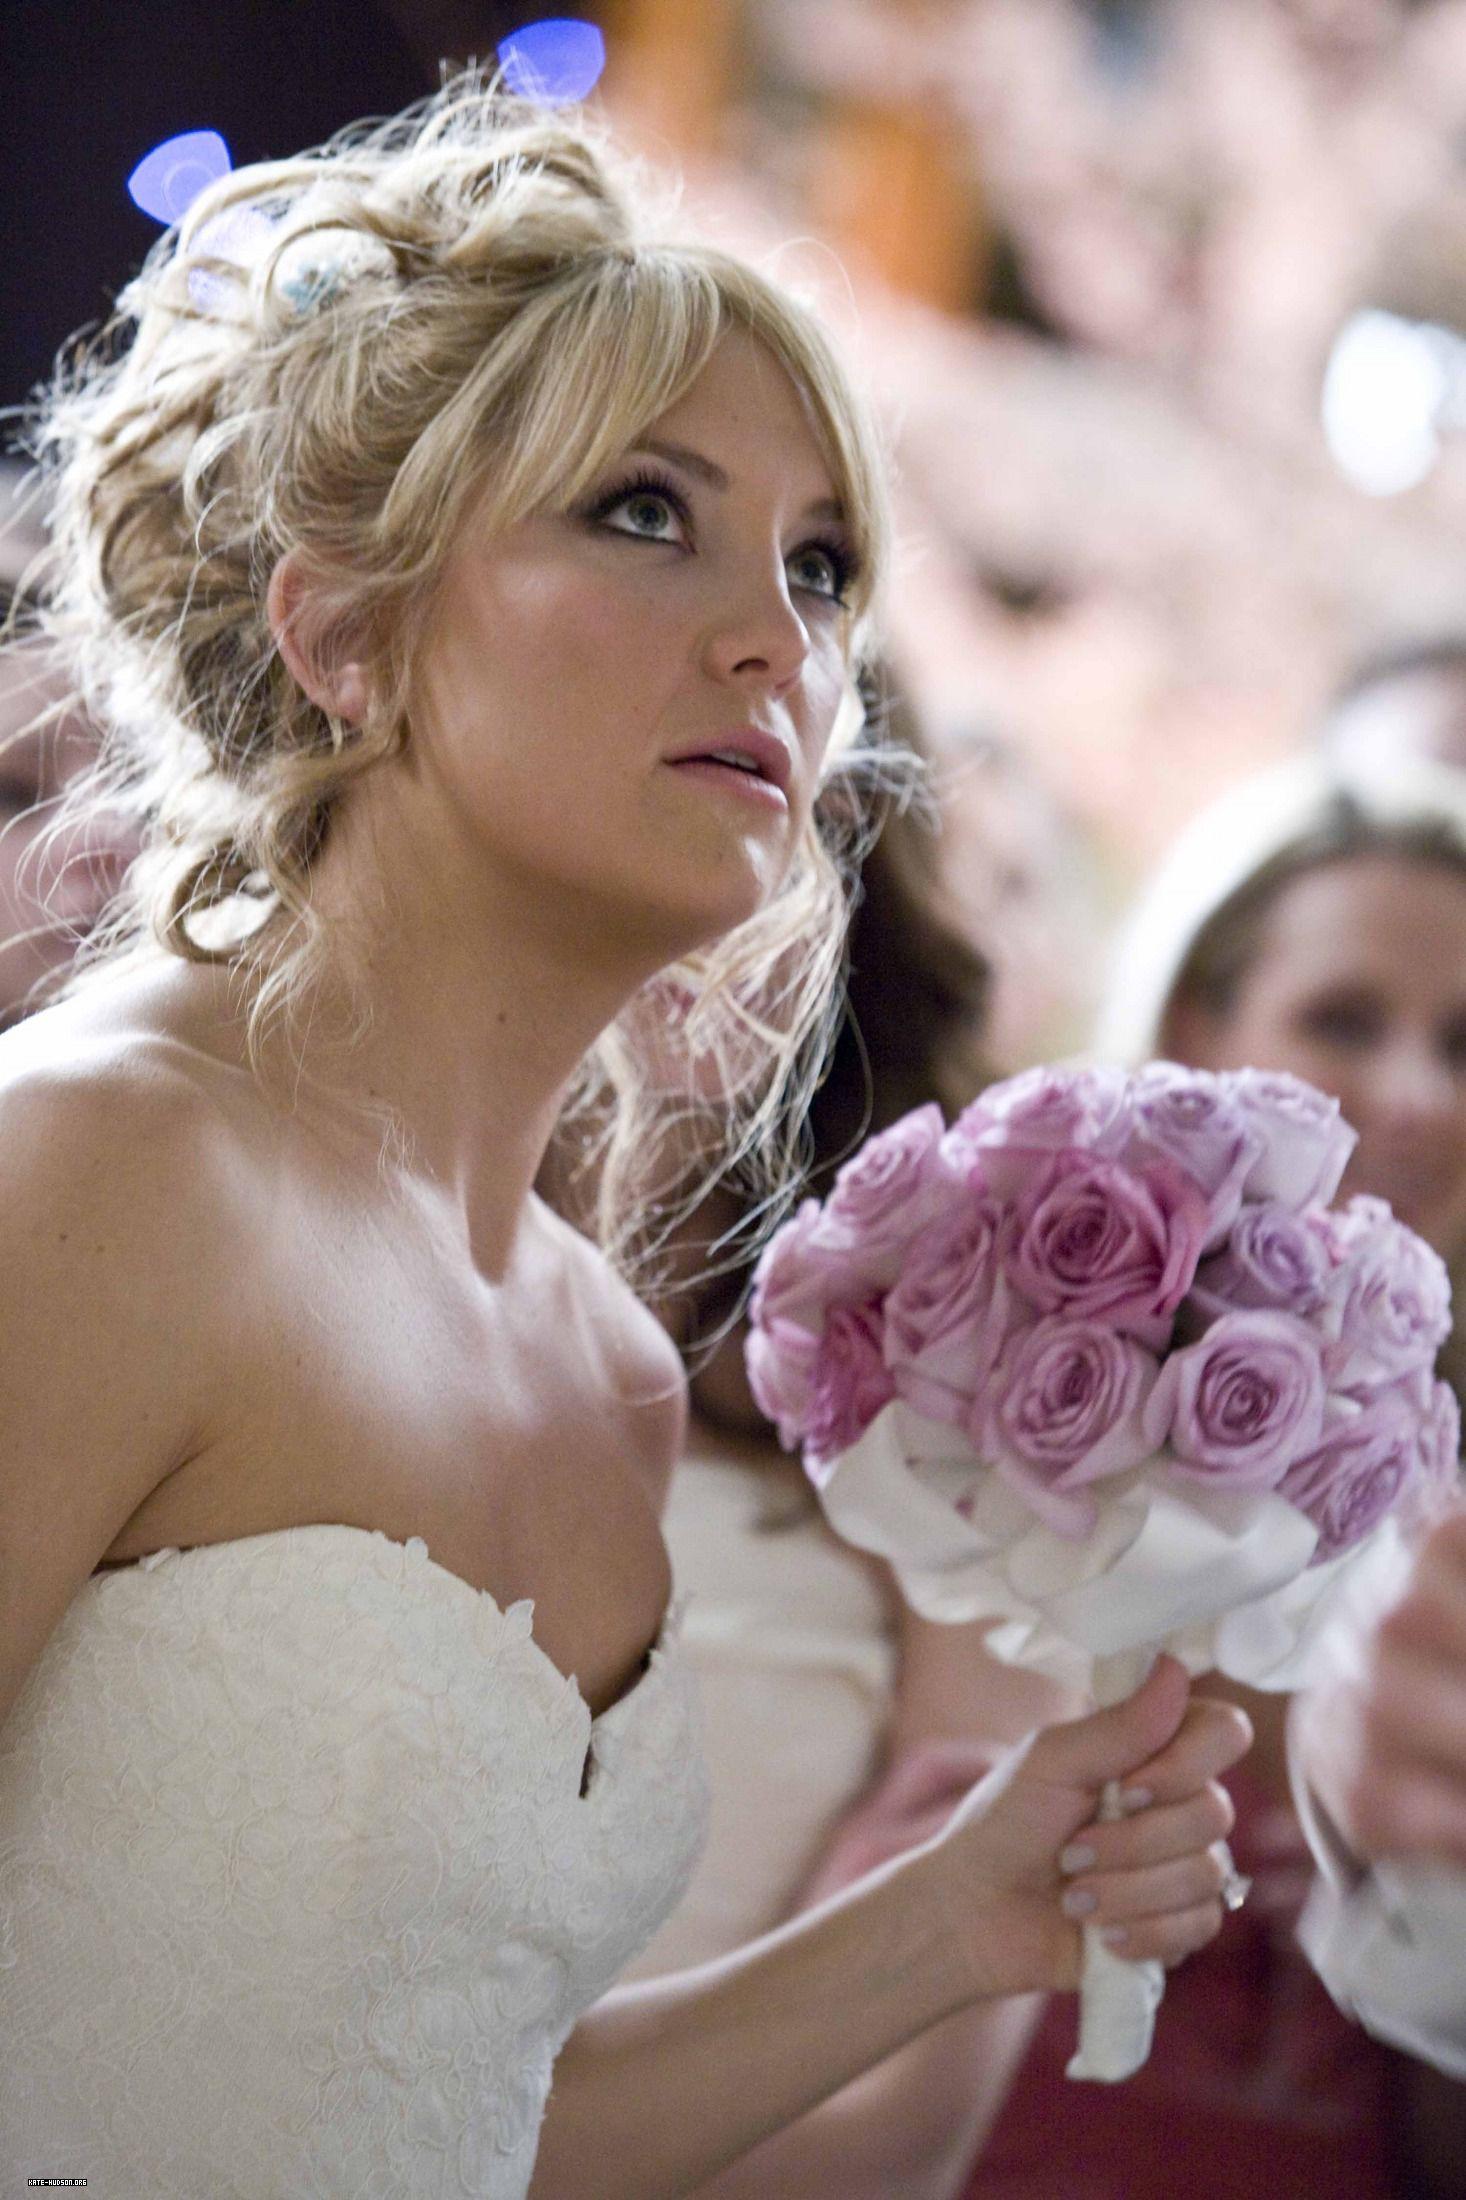 College sexparty war bride weddings